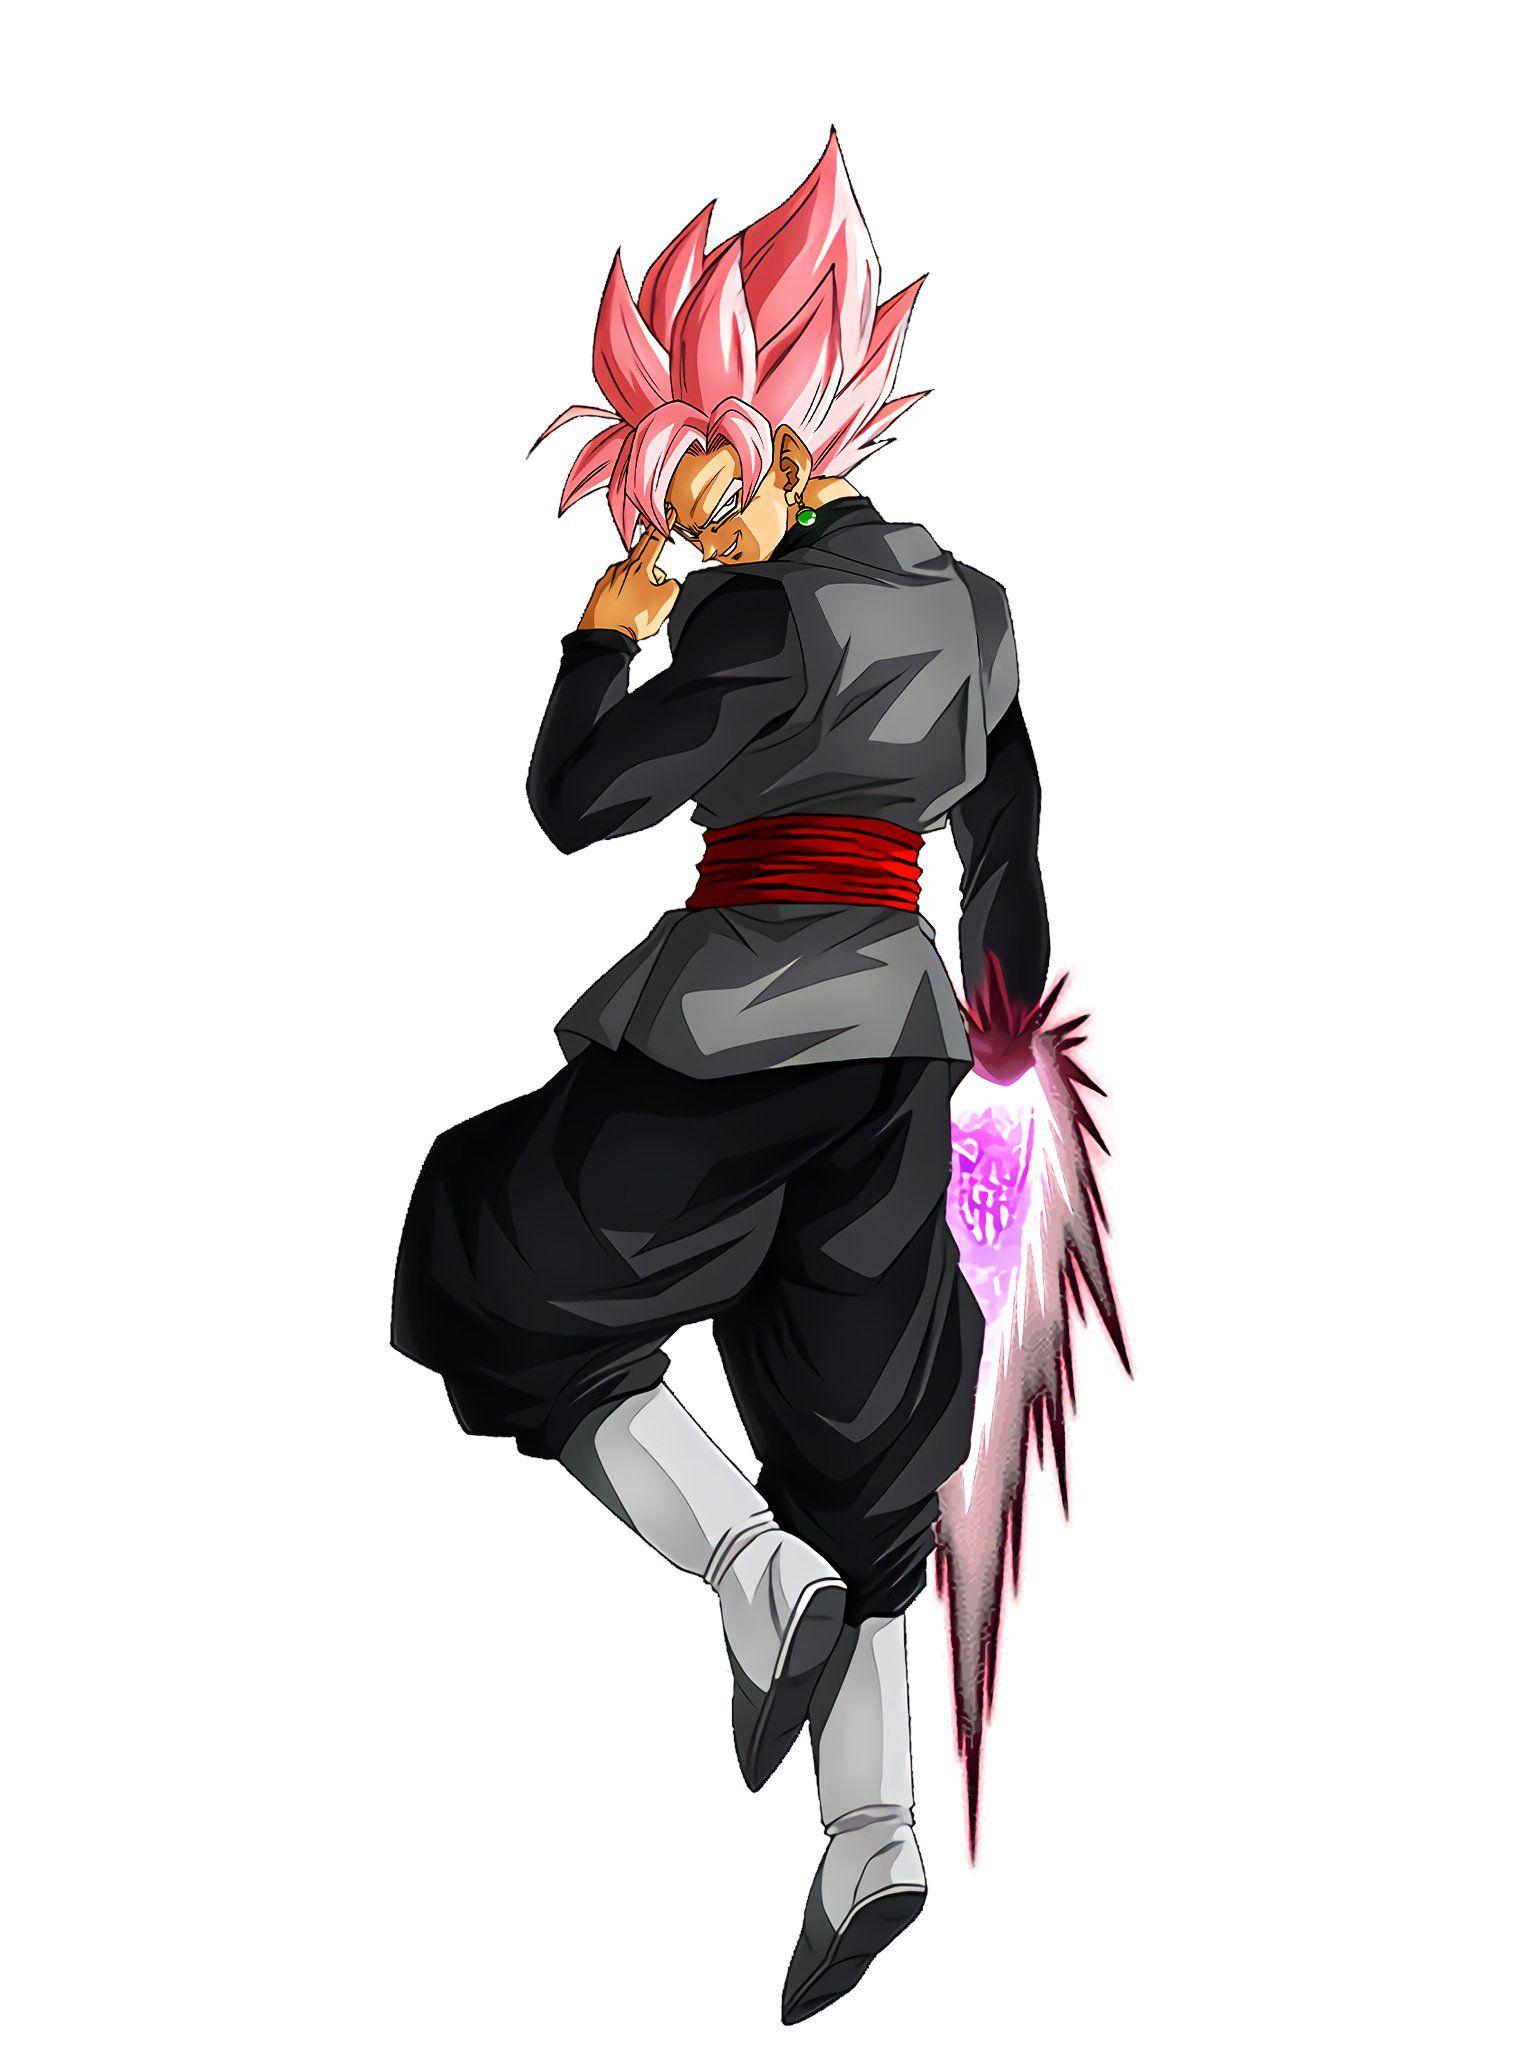 Hydros On Twitter Anime Dragon Ball Super Dragon Ball Super Art Super Saiyan Rose